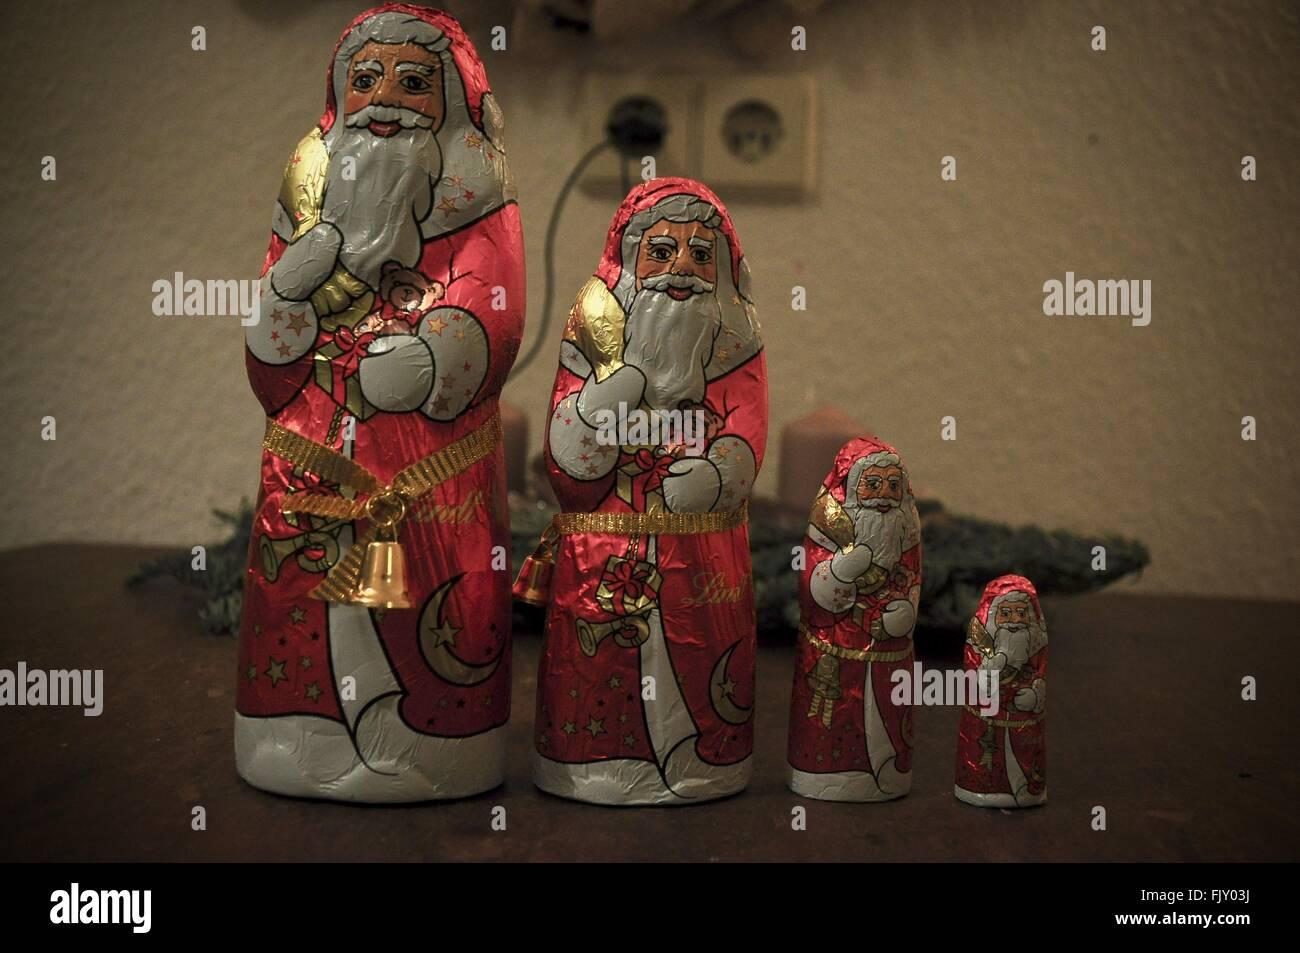 Santa claus figurines stock photos santa claus figurines stock